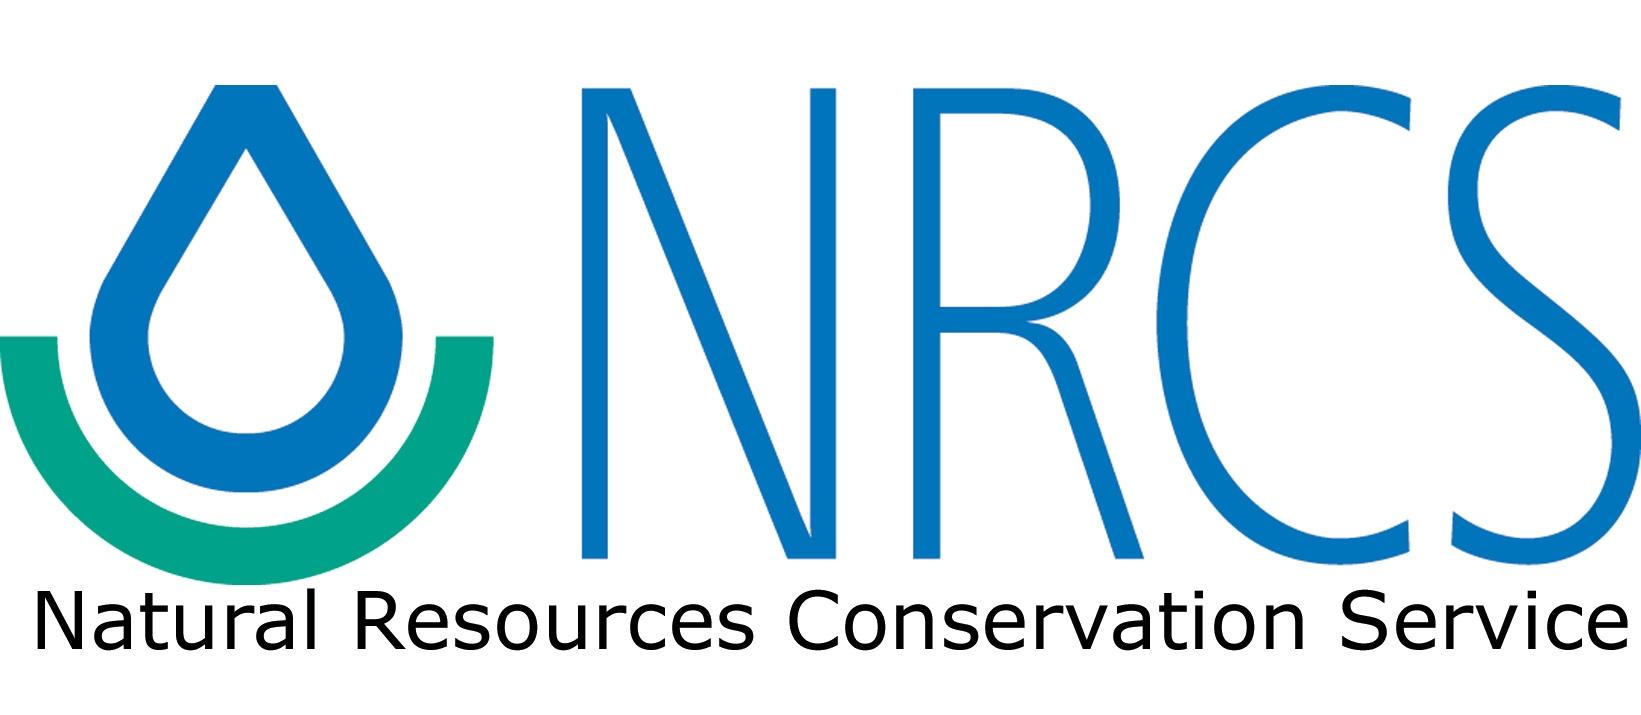 Natural Resources Conservation Service Nrcs